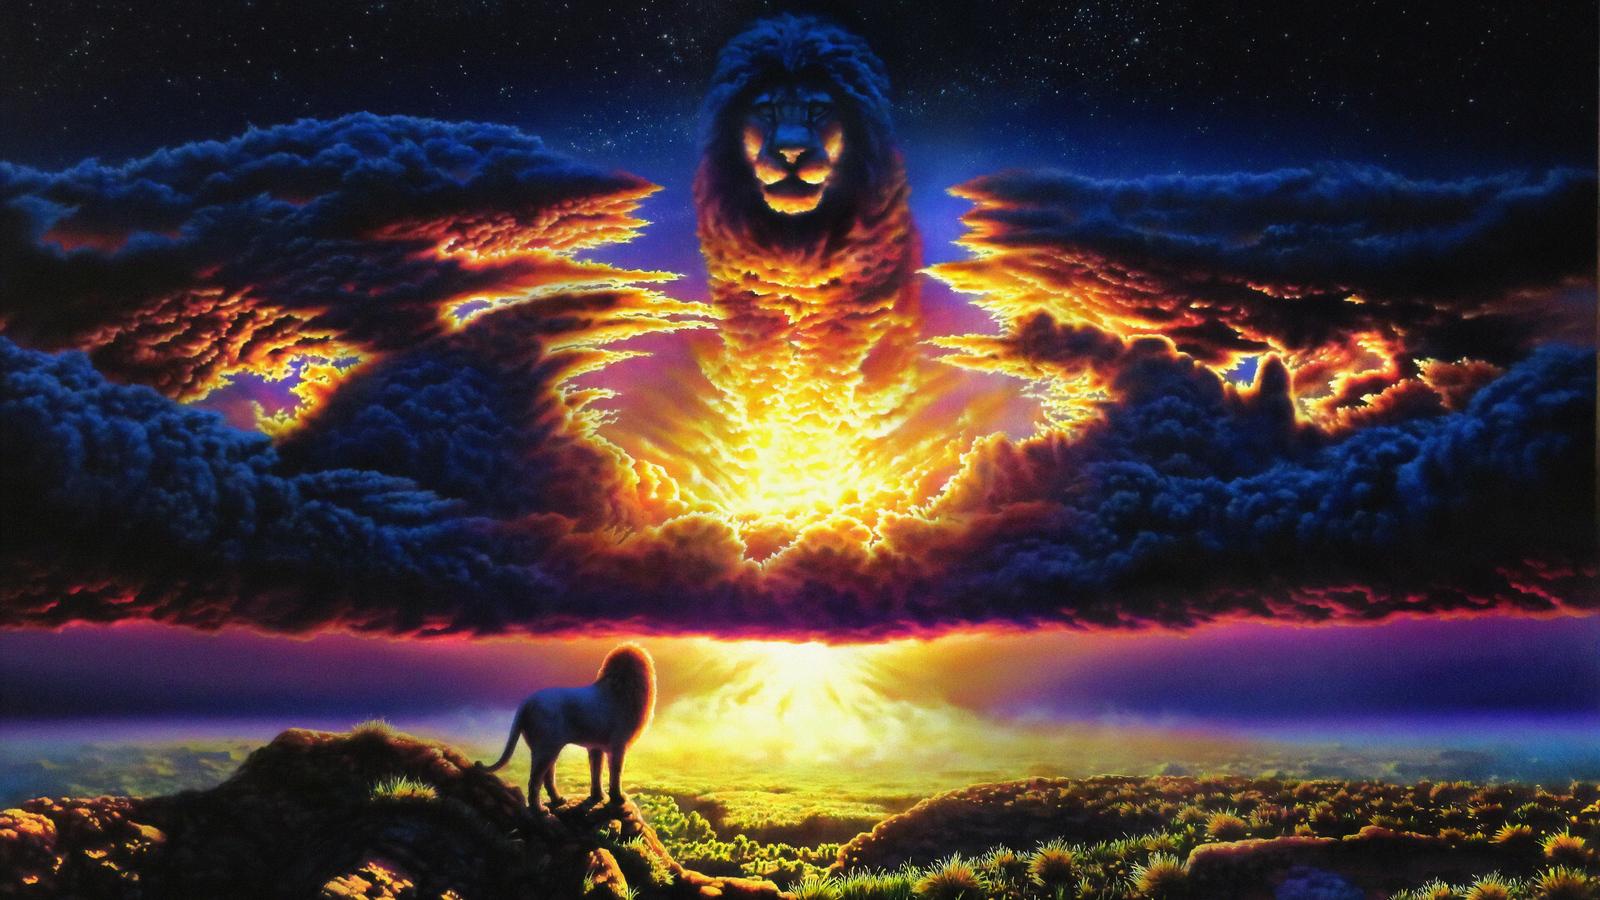 the-lion-king-2019-art-lu.jpg